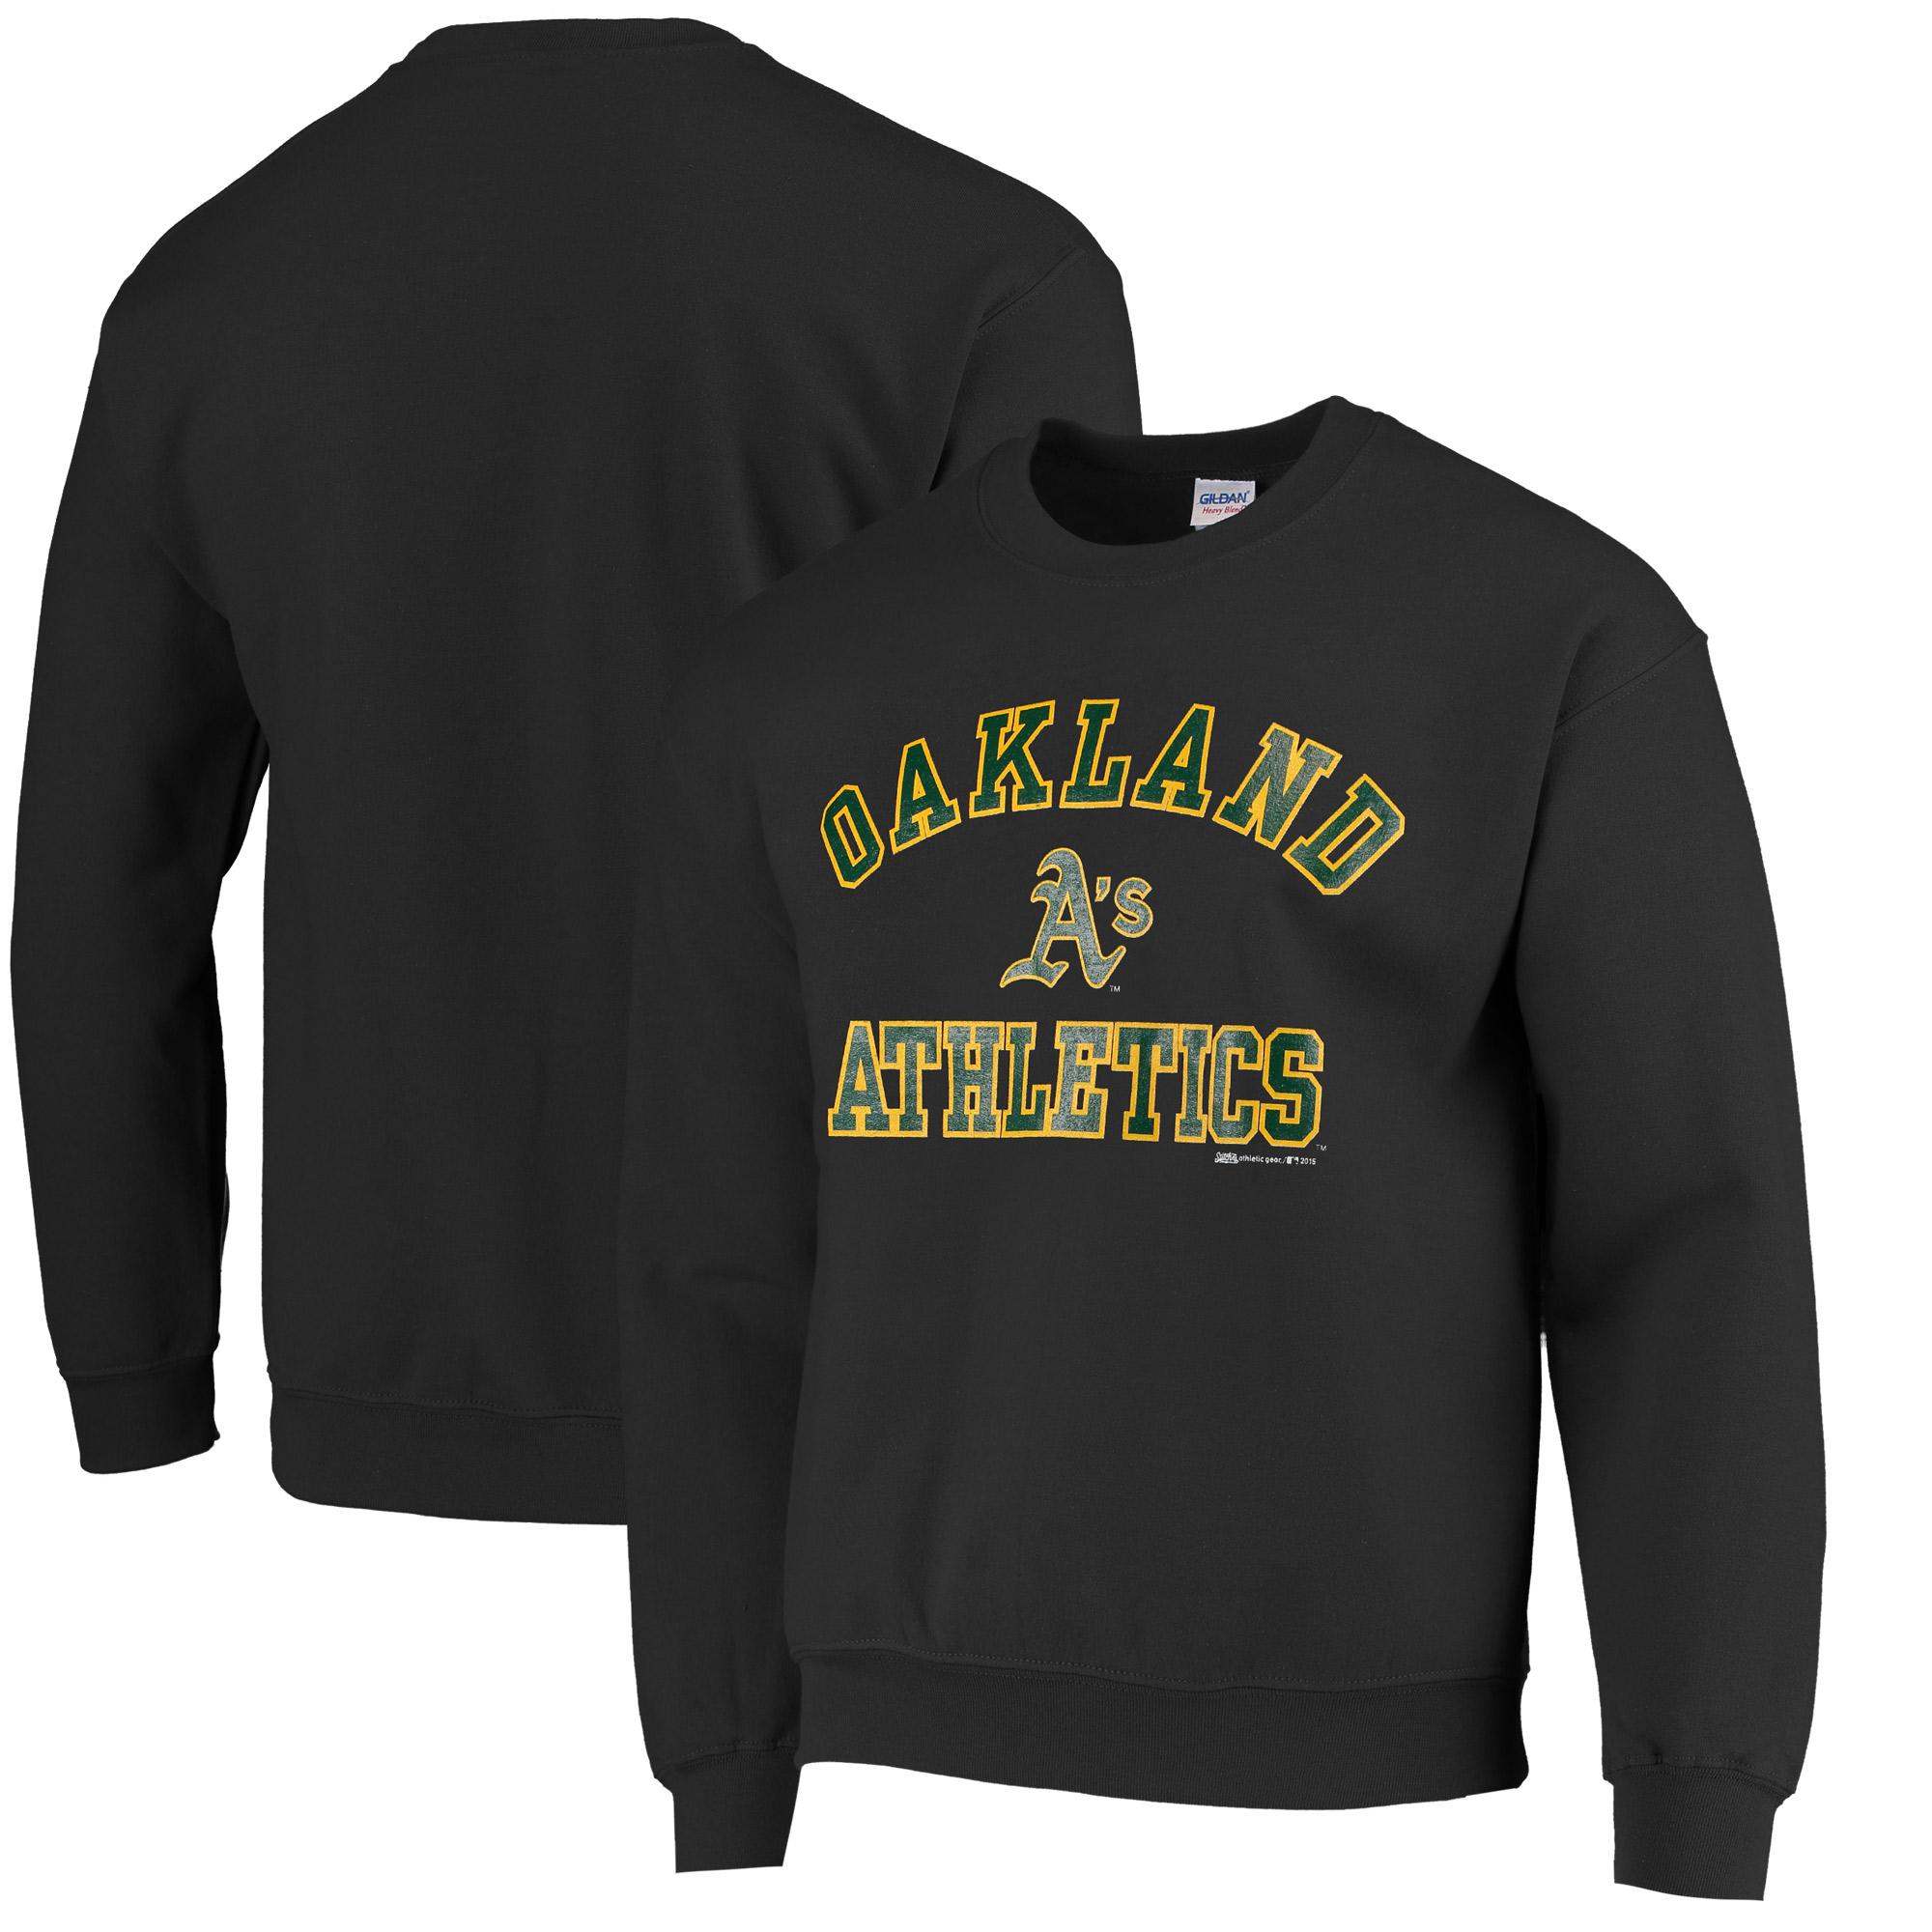 Stitches Oakland Athletics Fleece Crew Neck Sweatshirt - Black